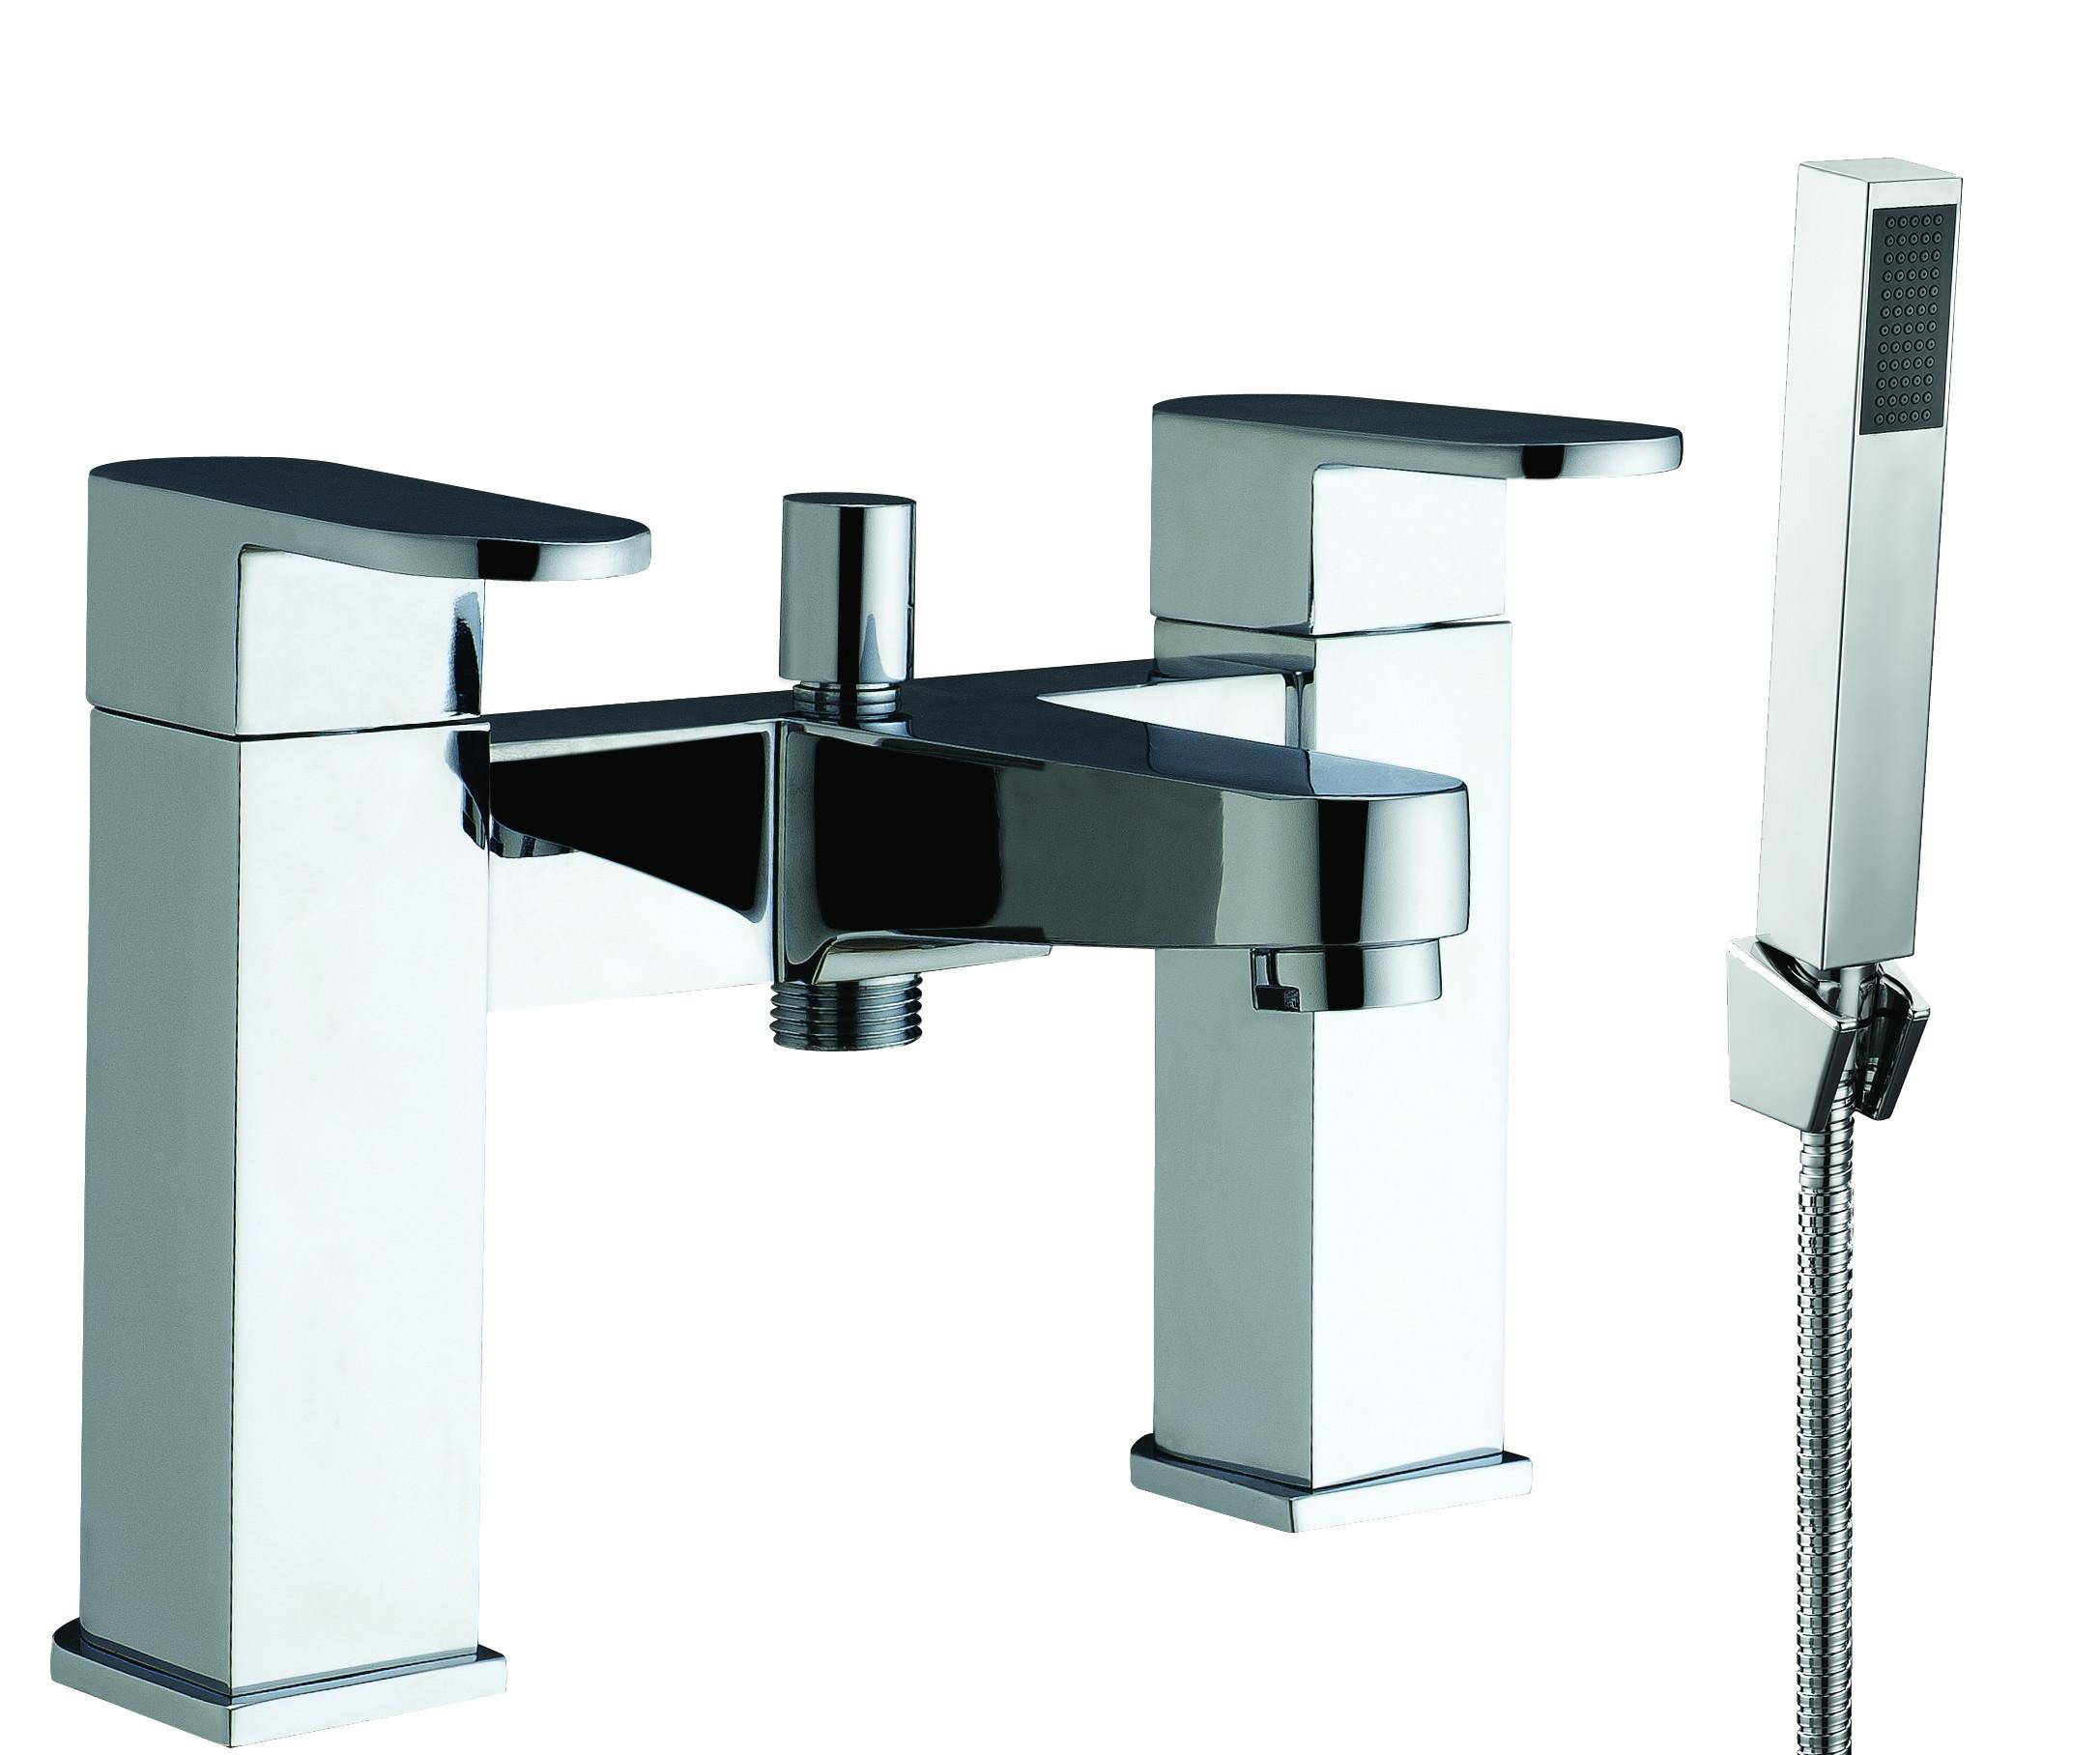 Caprice Bath Shower Mixer